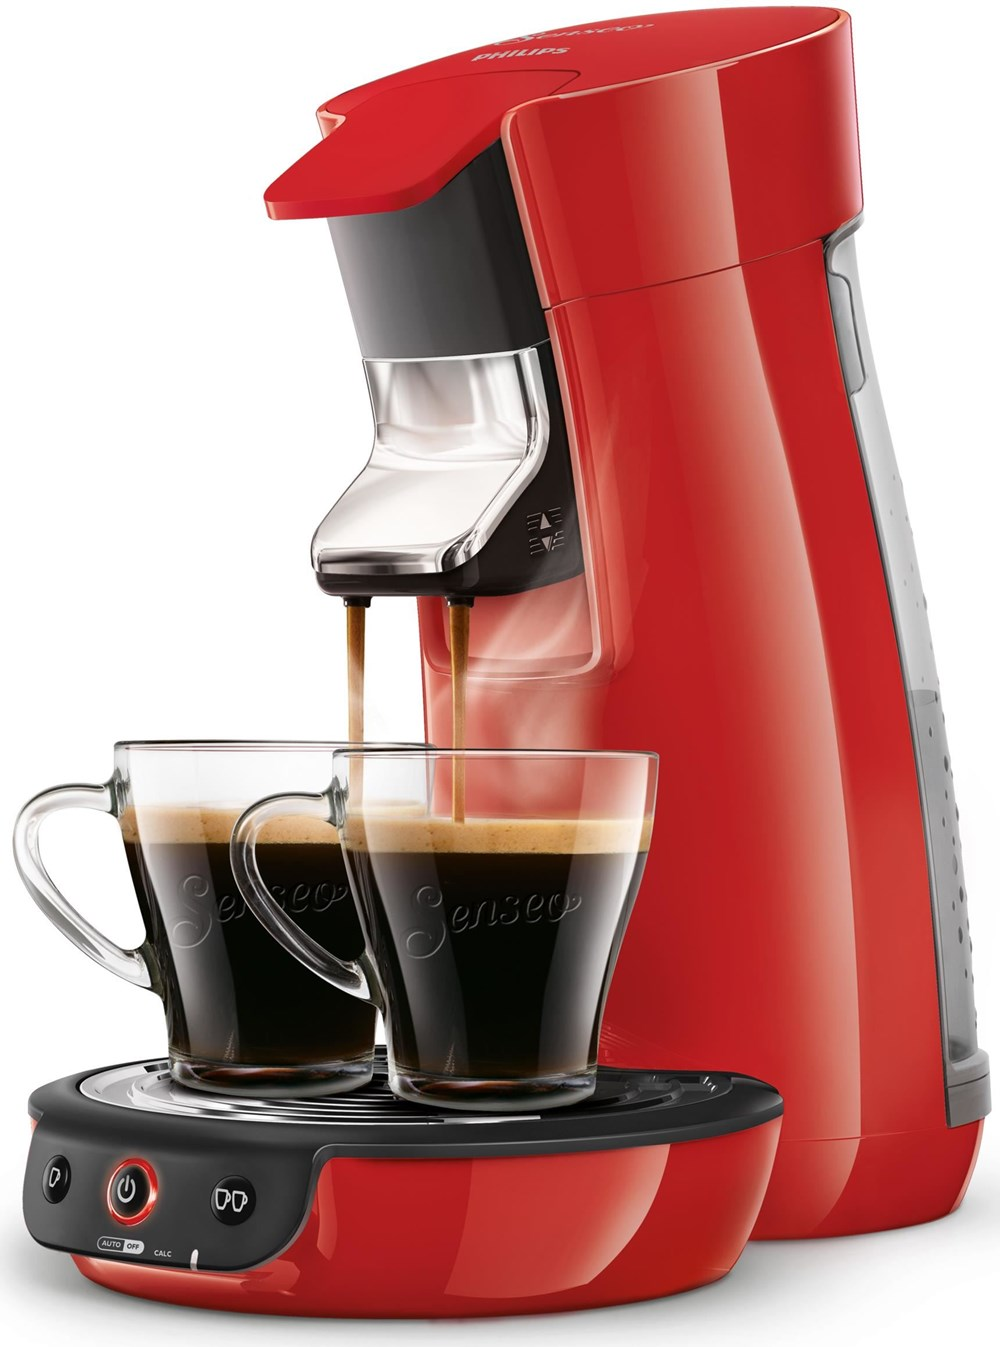 philips senseo viva caf coffee pod machine hd7829 red. Black Bedroom Furniture Sets. Home Design Ideas